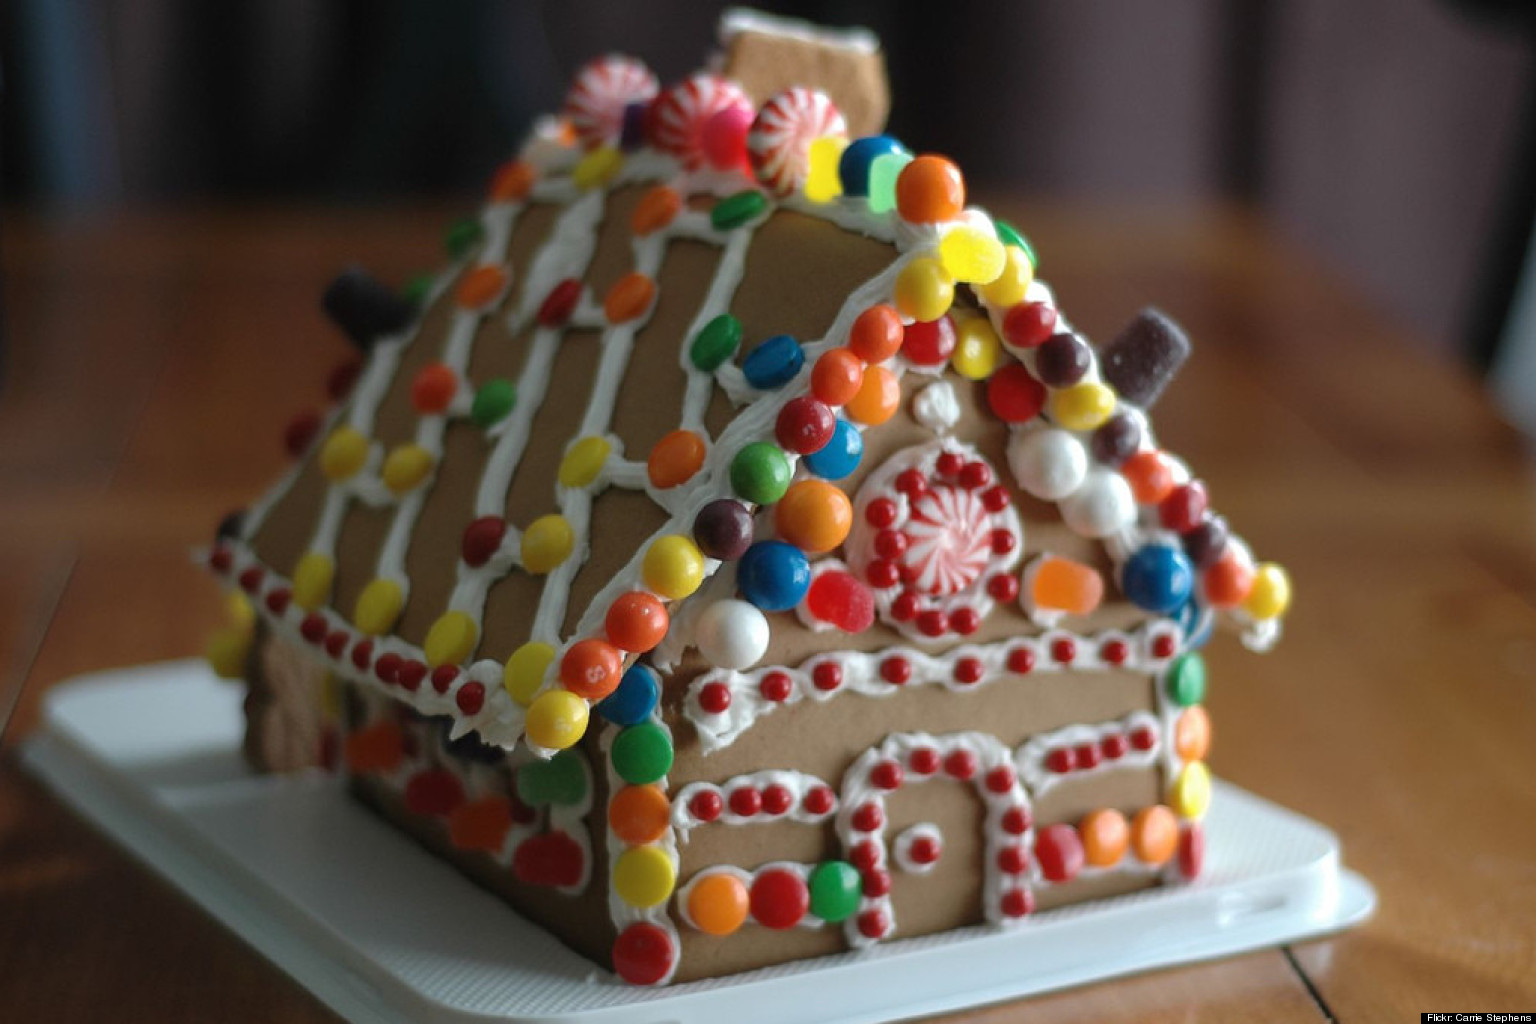 Life Size Gingerbread House Recipe Calculator